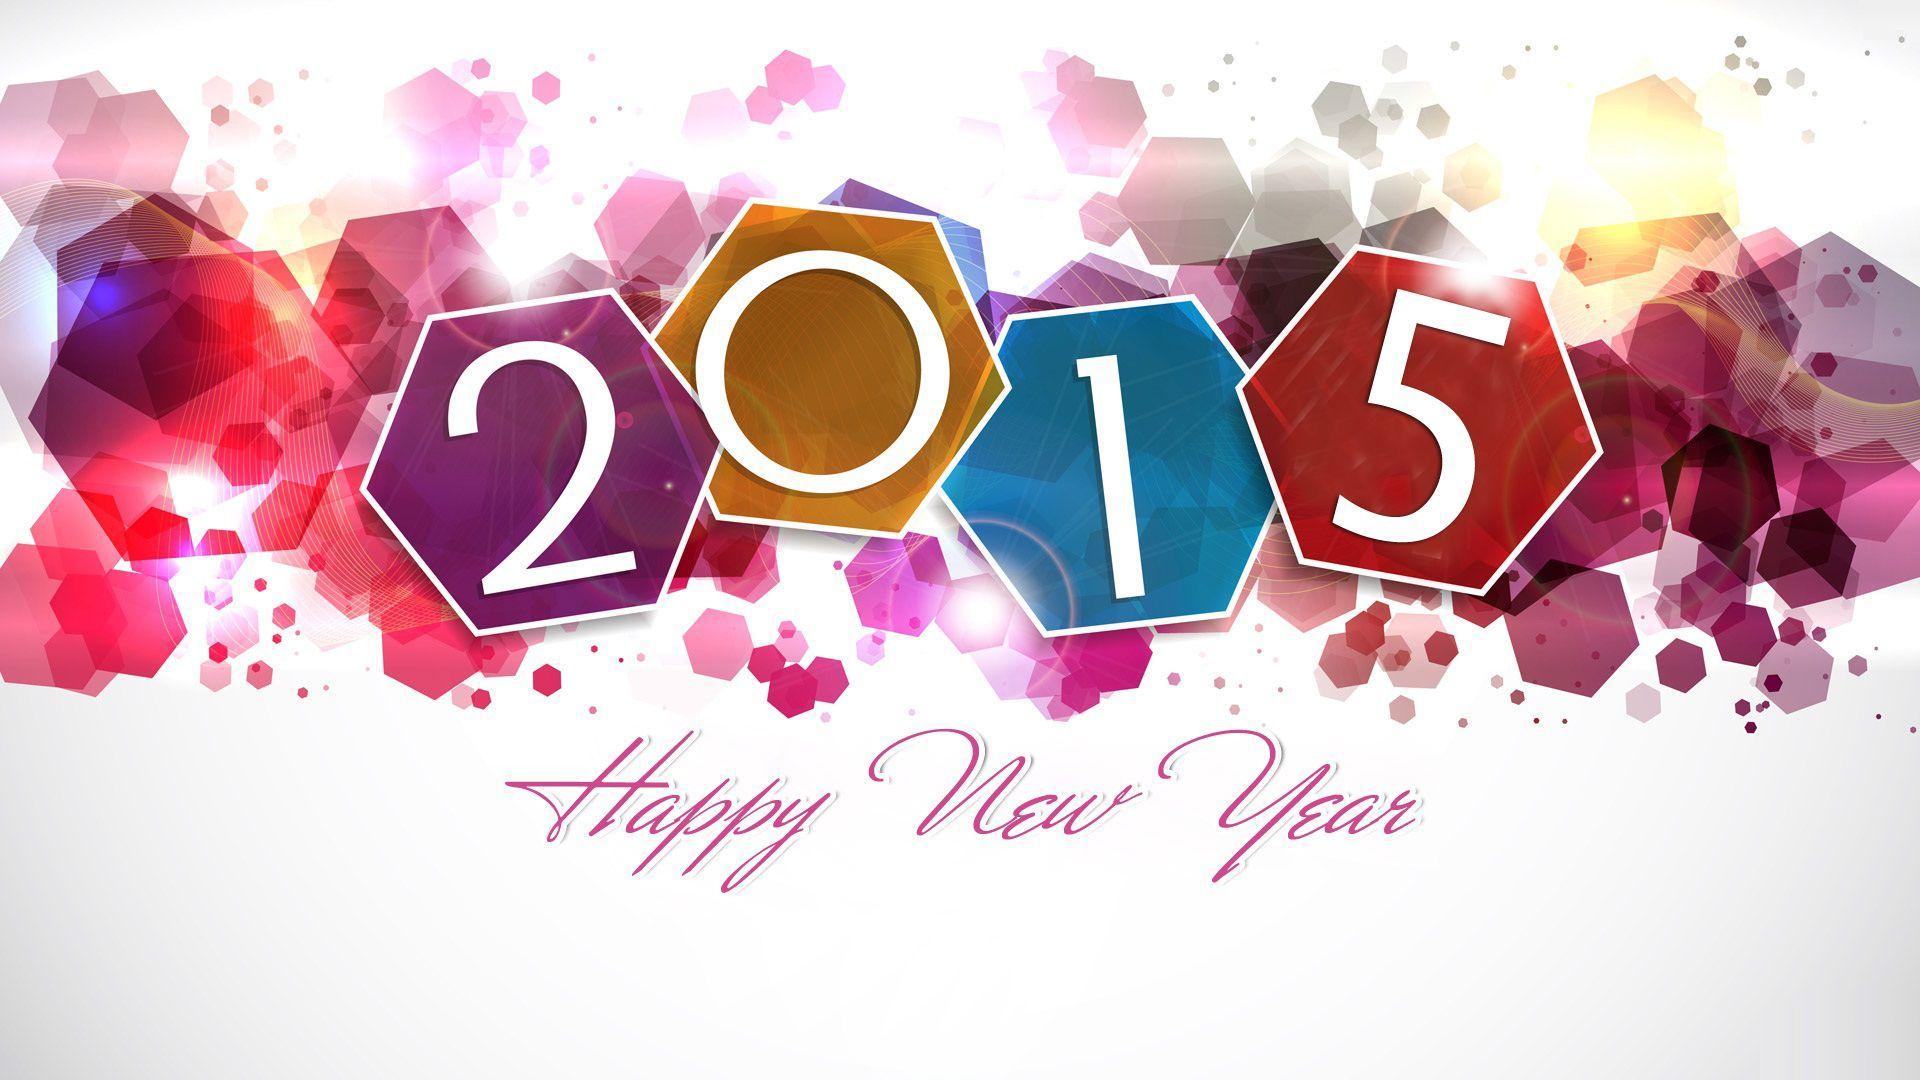 New Year 2015 Computer Background wallpaper Techbeasts 1920x1080